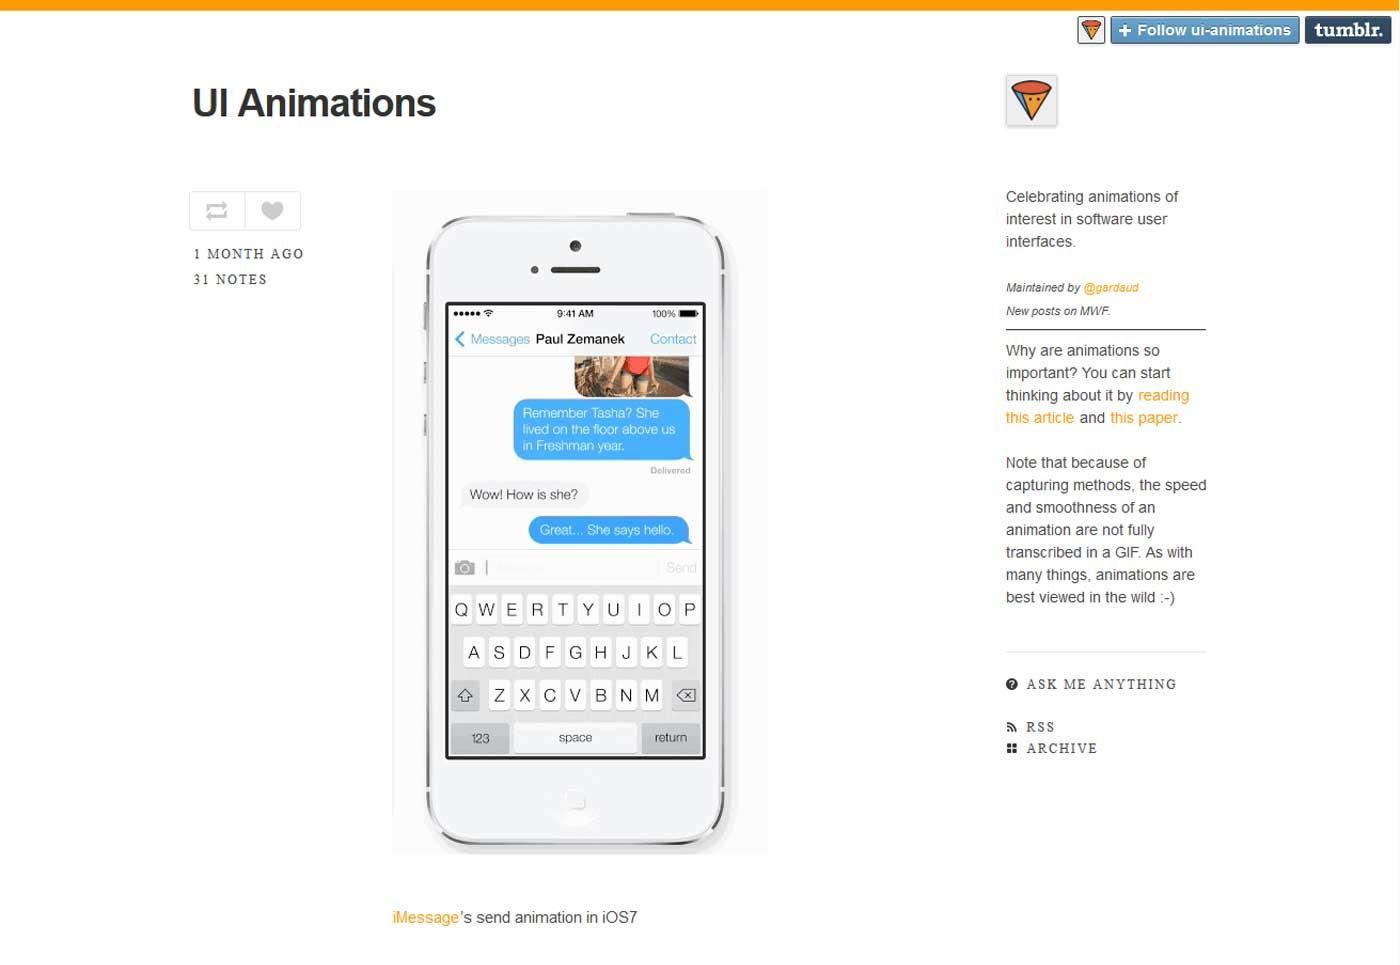 UI animations